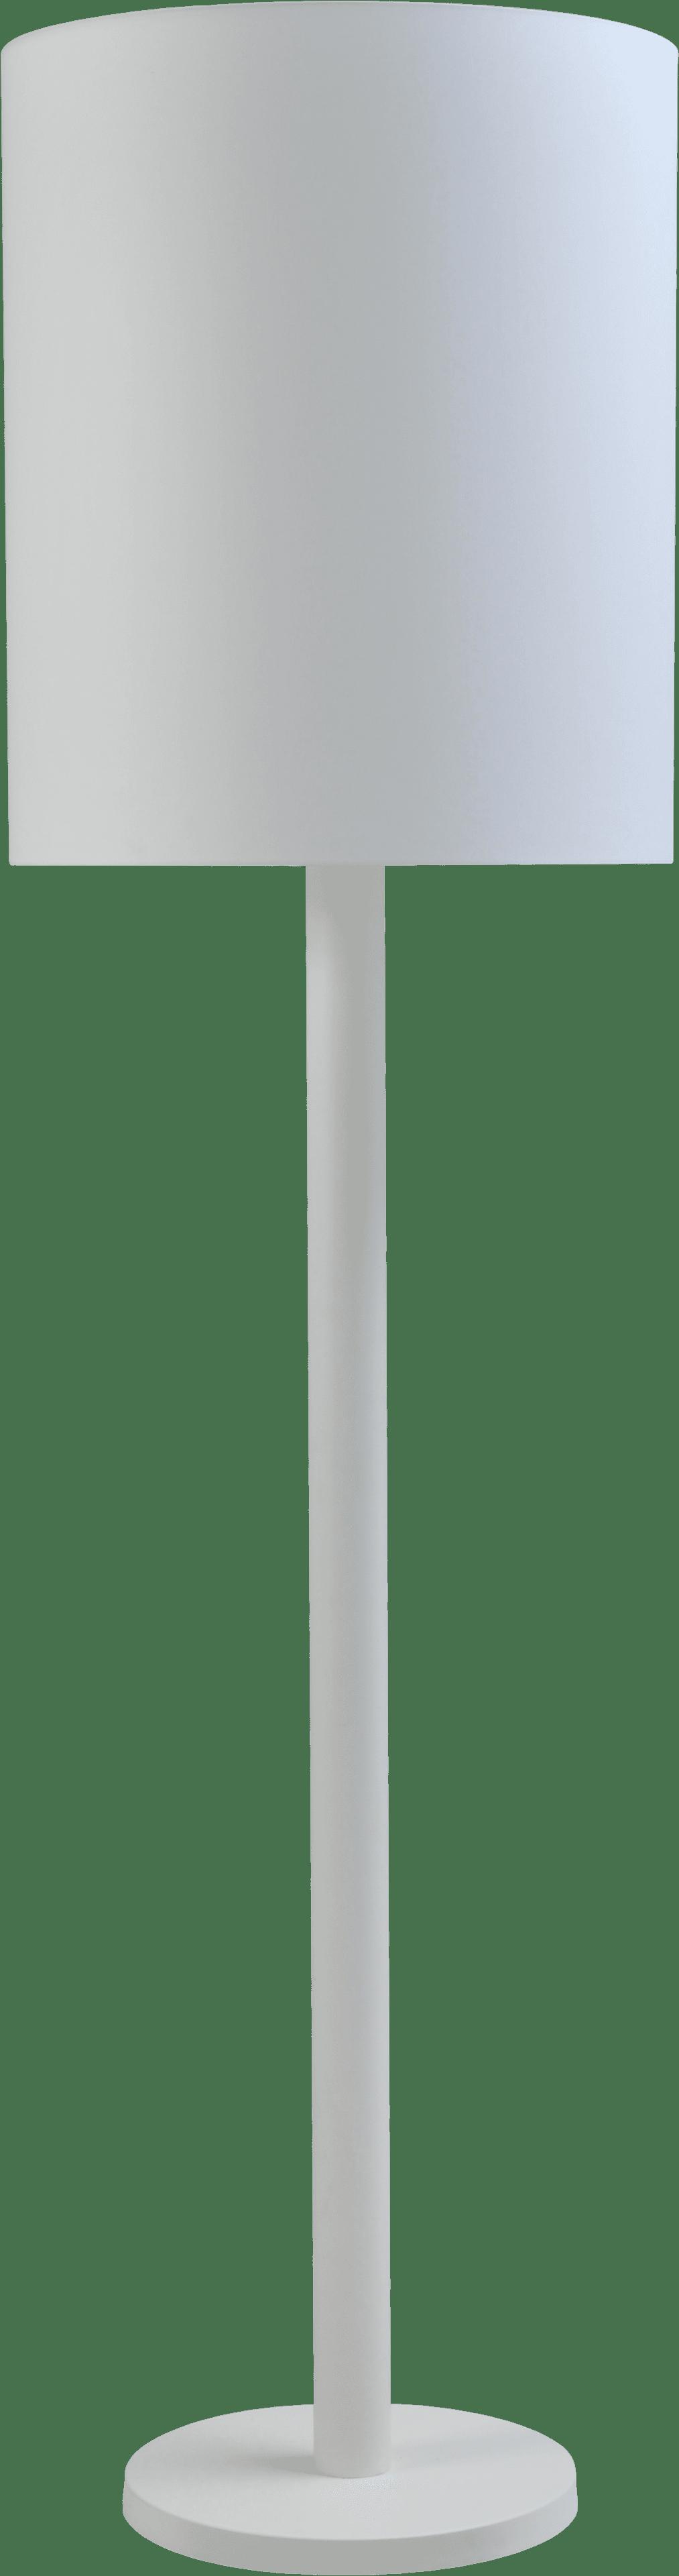 Al Tonno VL AL TONNO WHITE TUBE Ø5CM H.175CM